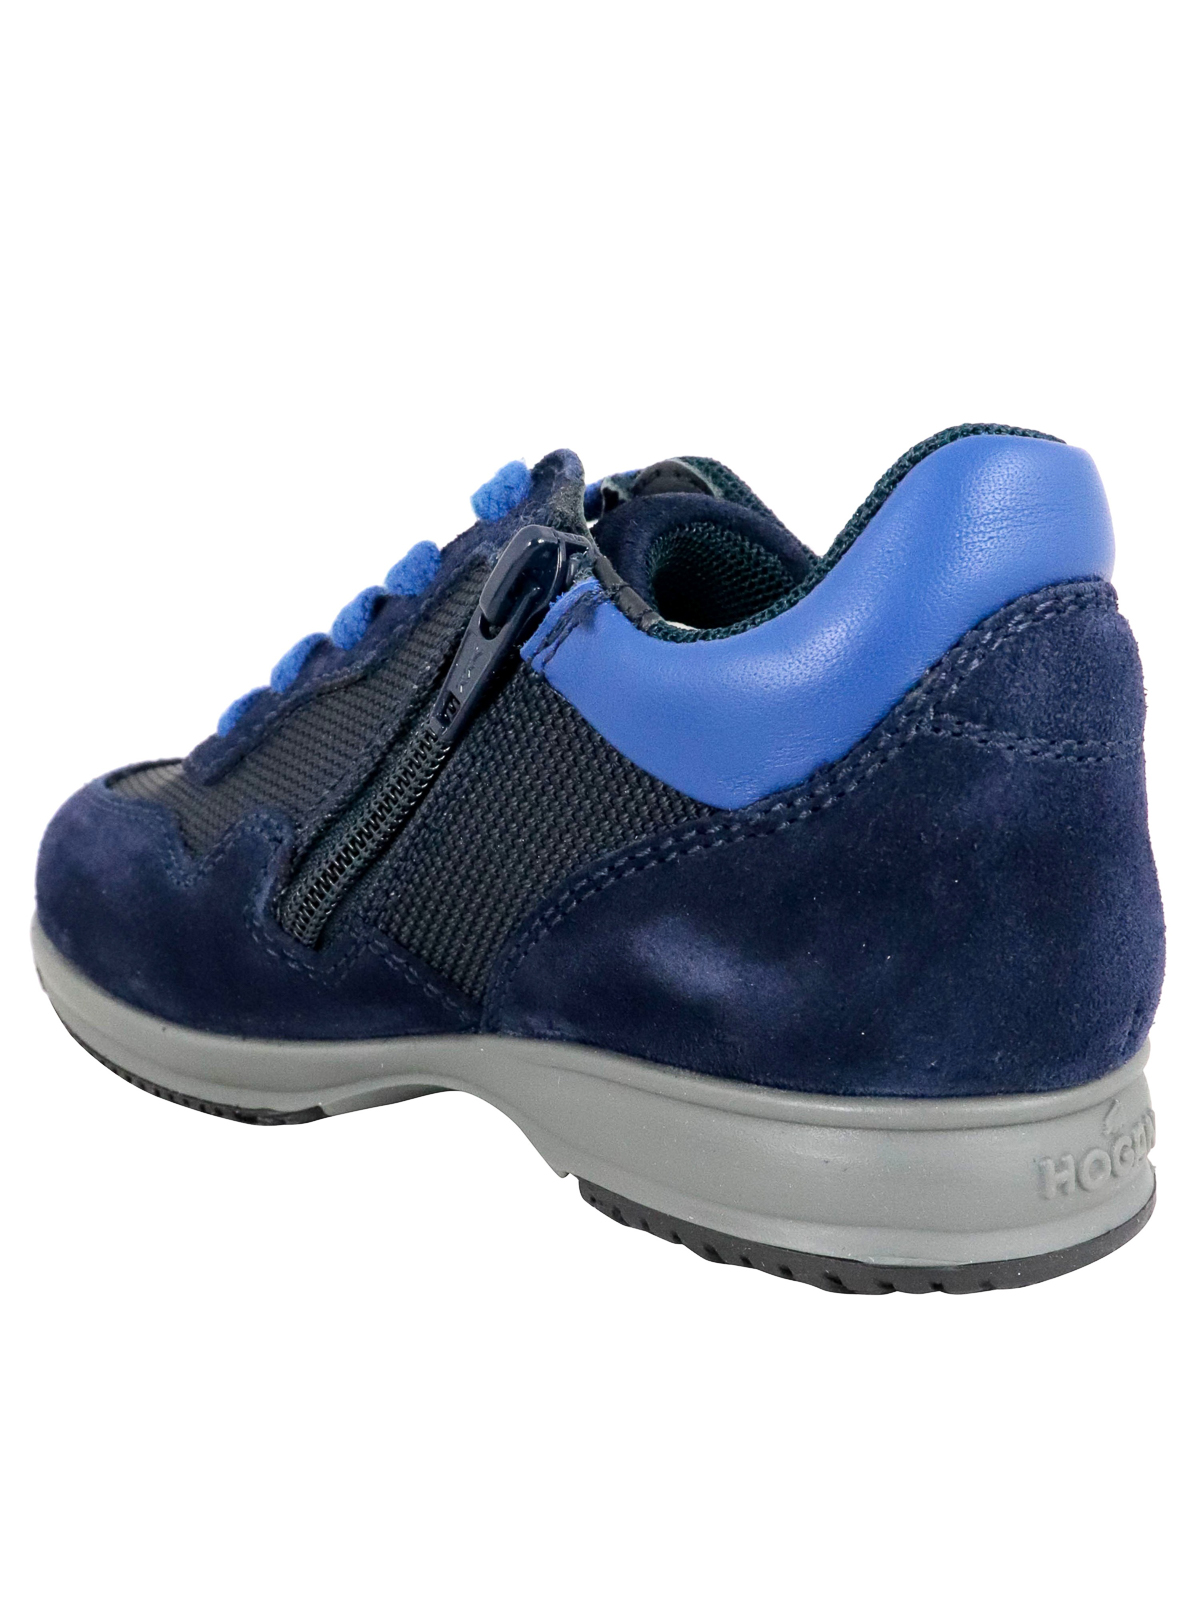 Hogan Junior - Interactive sneakers - trainers - HXT0920V310JYCT02V